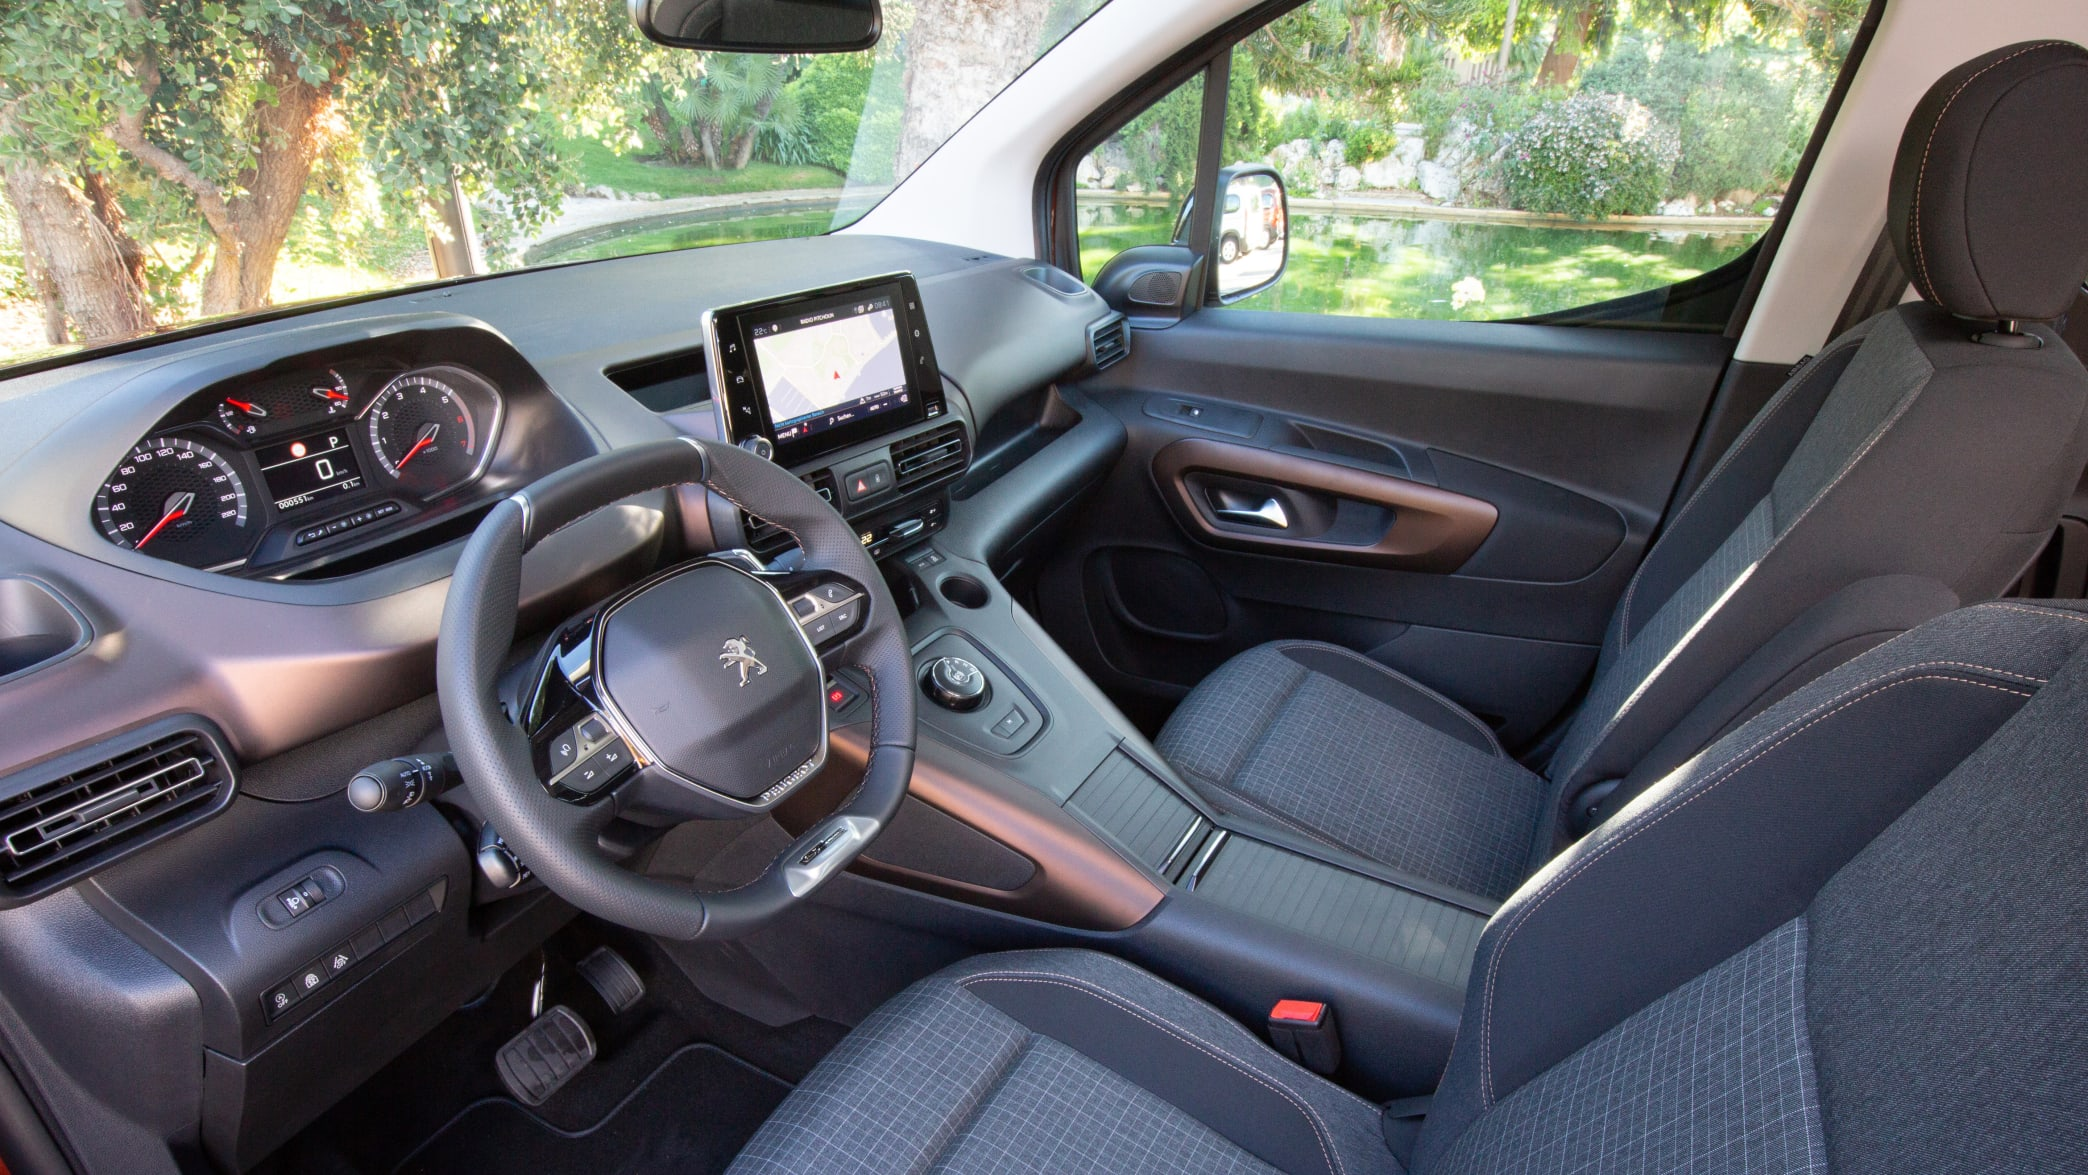 Cockpit eines Peugeot Rifter